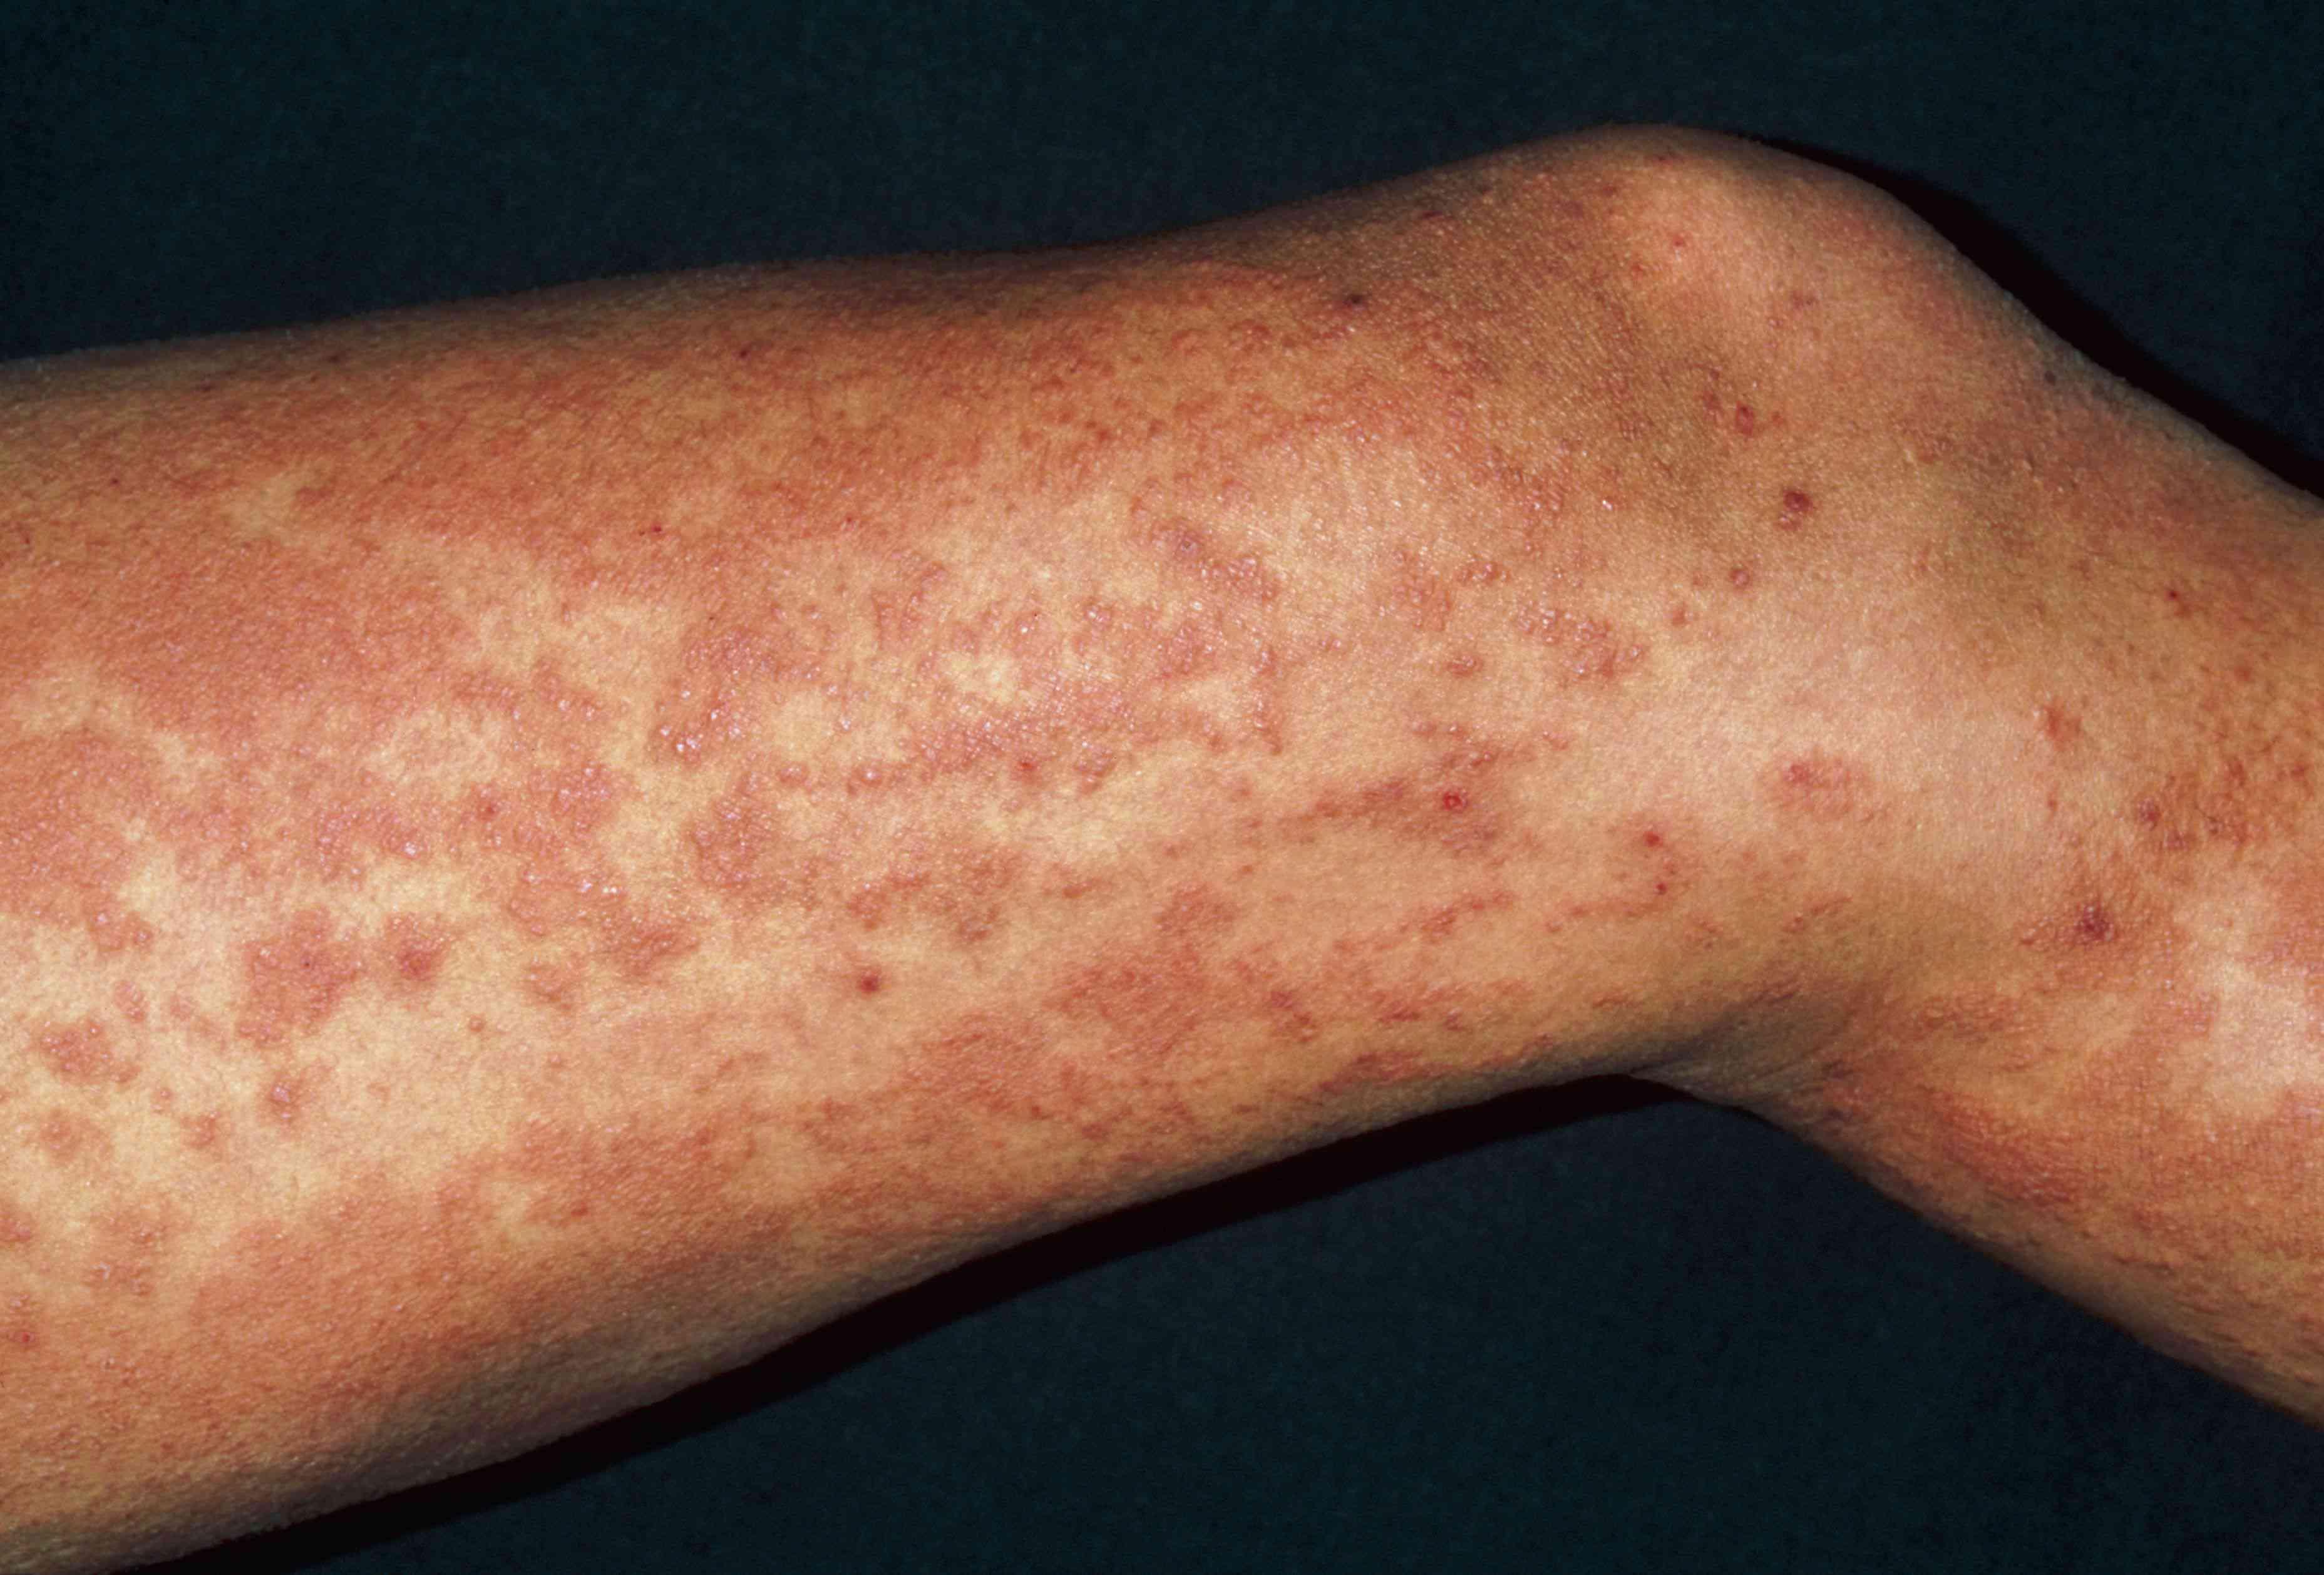 Urticaria Rash (Hives) On Legs Due to Exam Stress